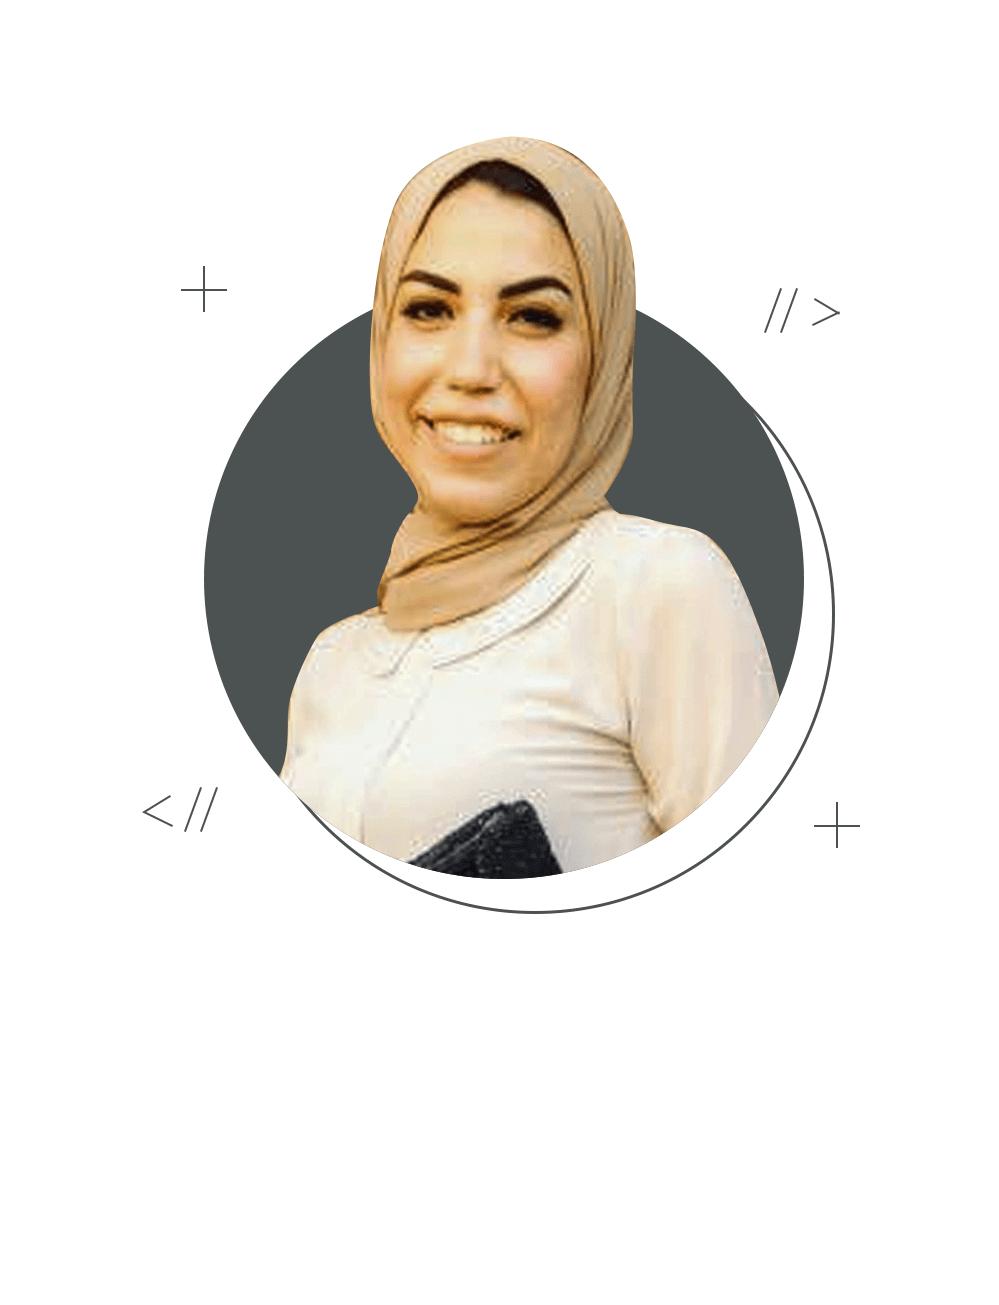 Esraa Ibrahim